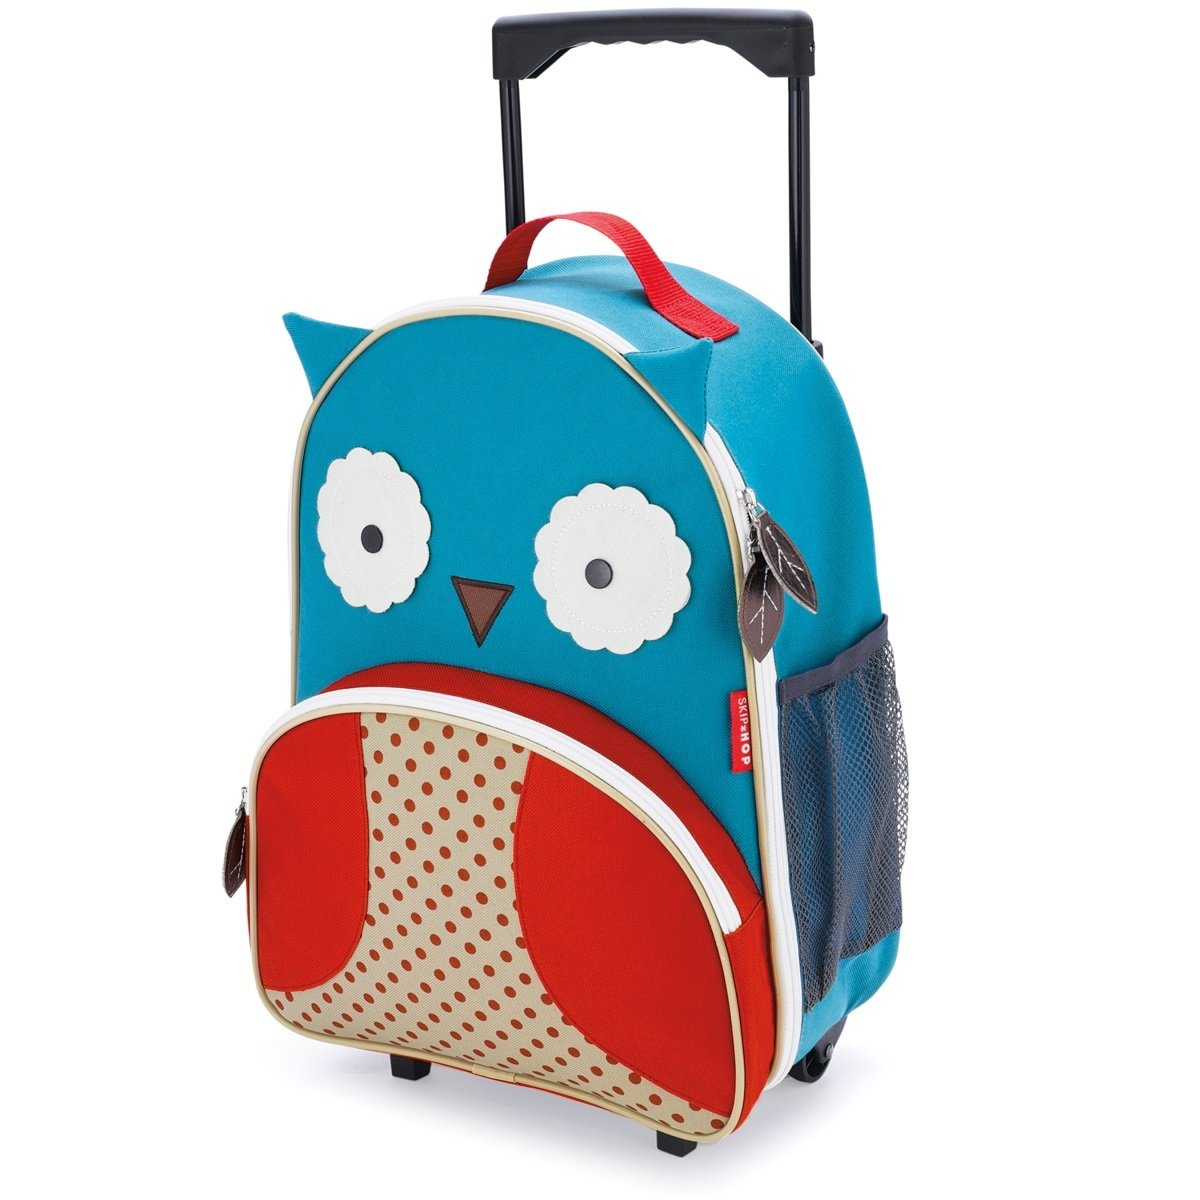 Zoo 可愛動物園小孩專用行李箱 - 貓頭鷹